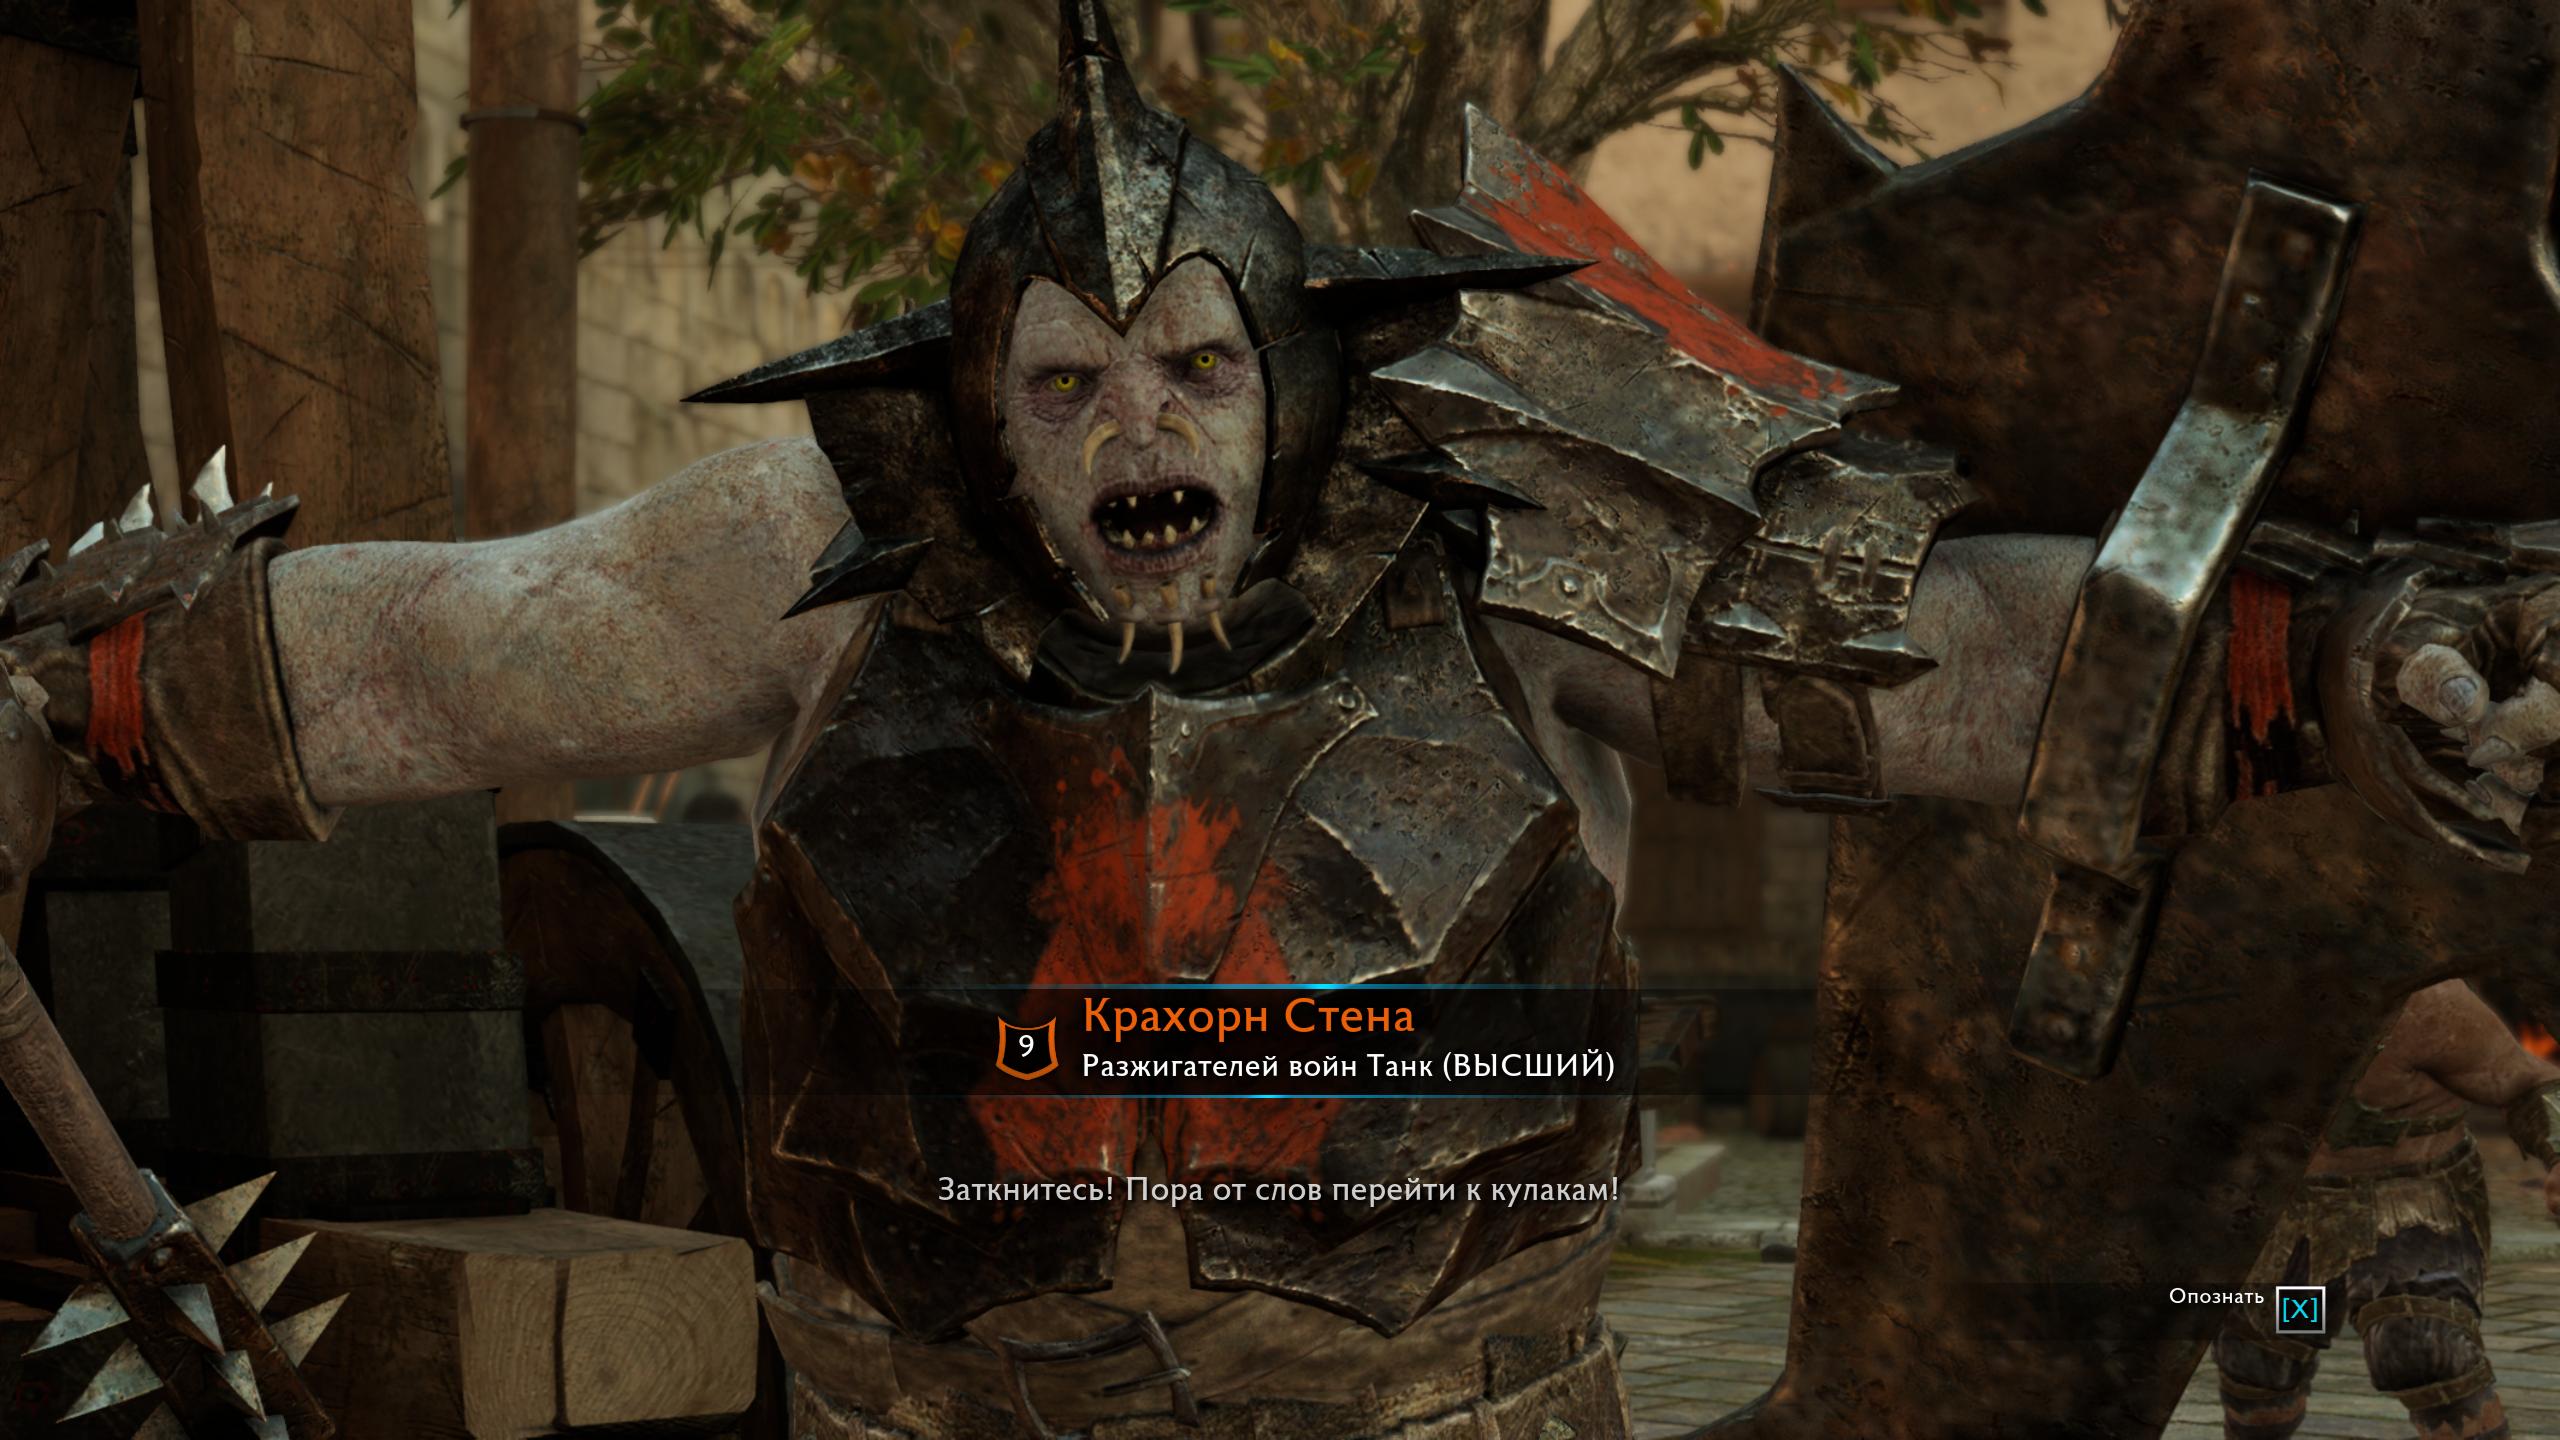 Крахорн Стена - Middle-earth: Shadow of War